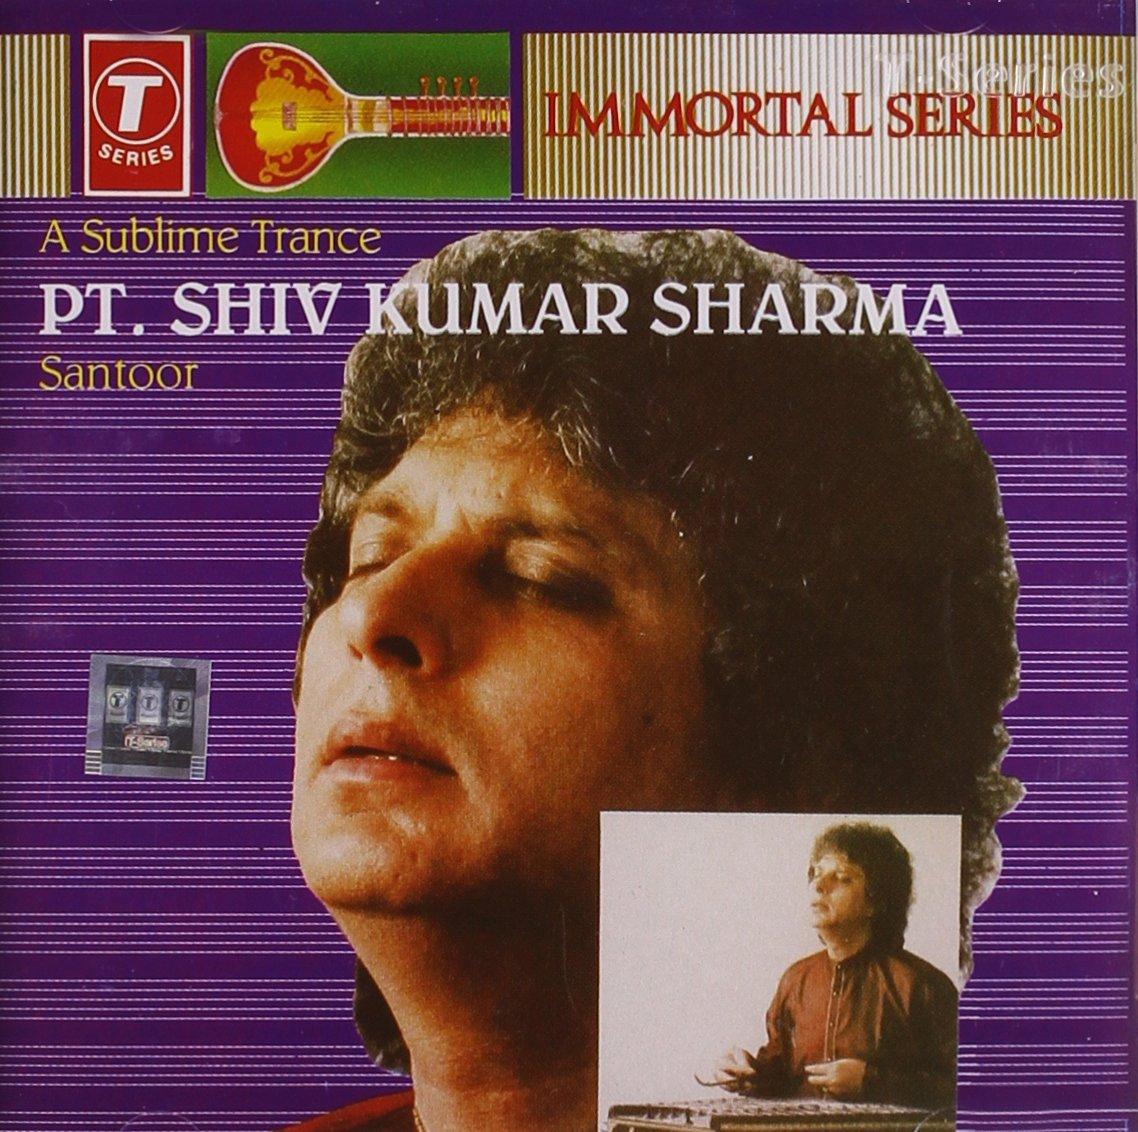 A Sublime Trance Pt. Shiv Kumar Sharma Santoor